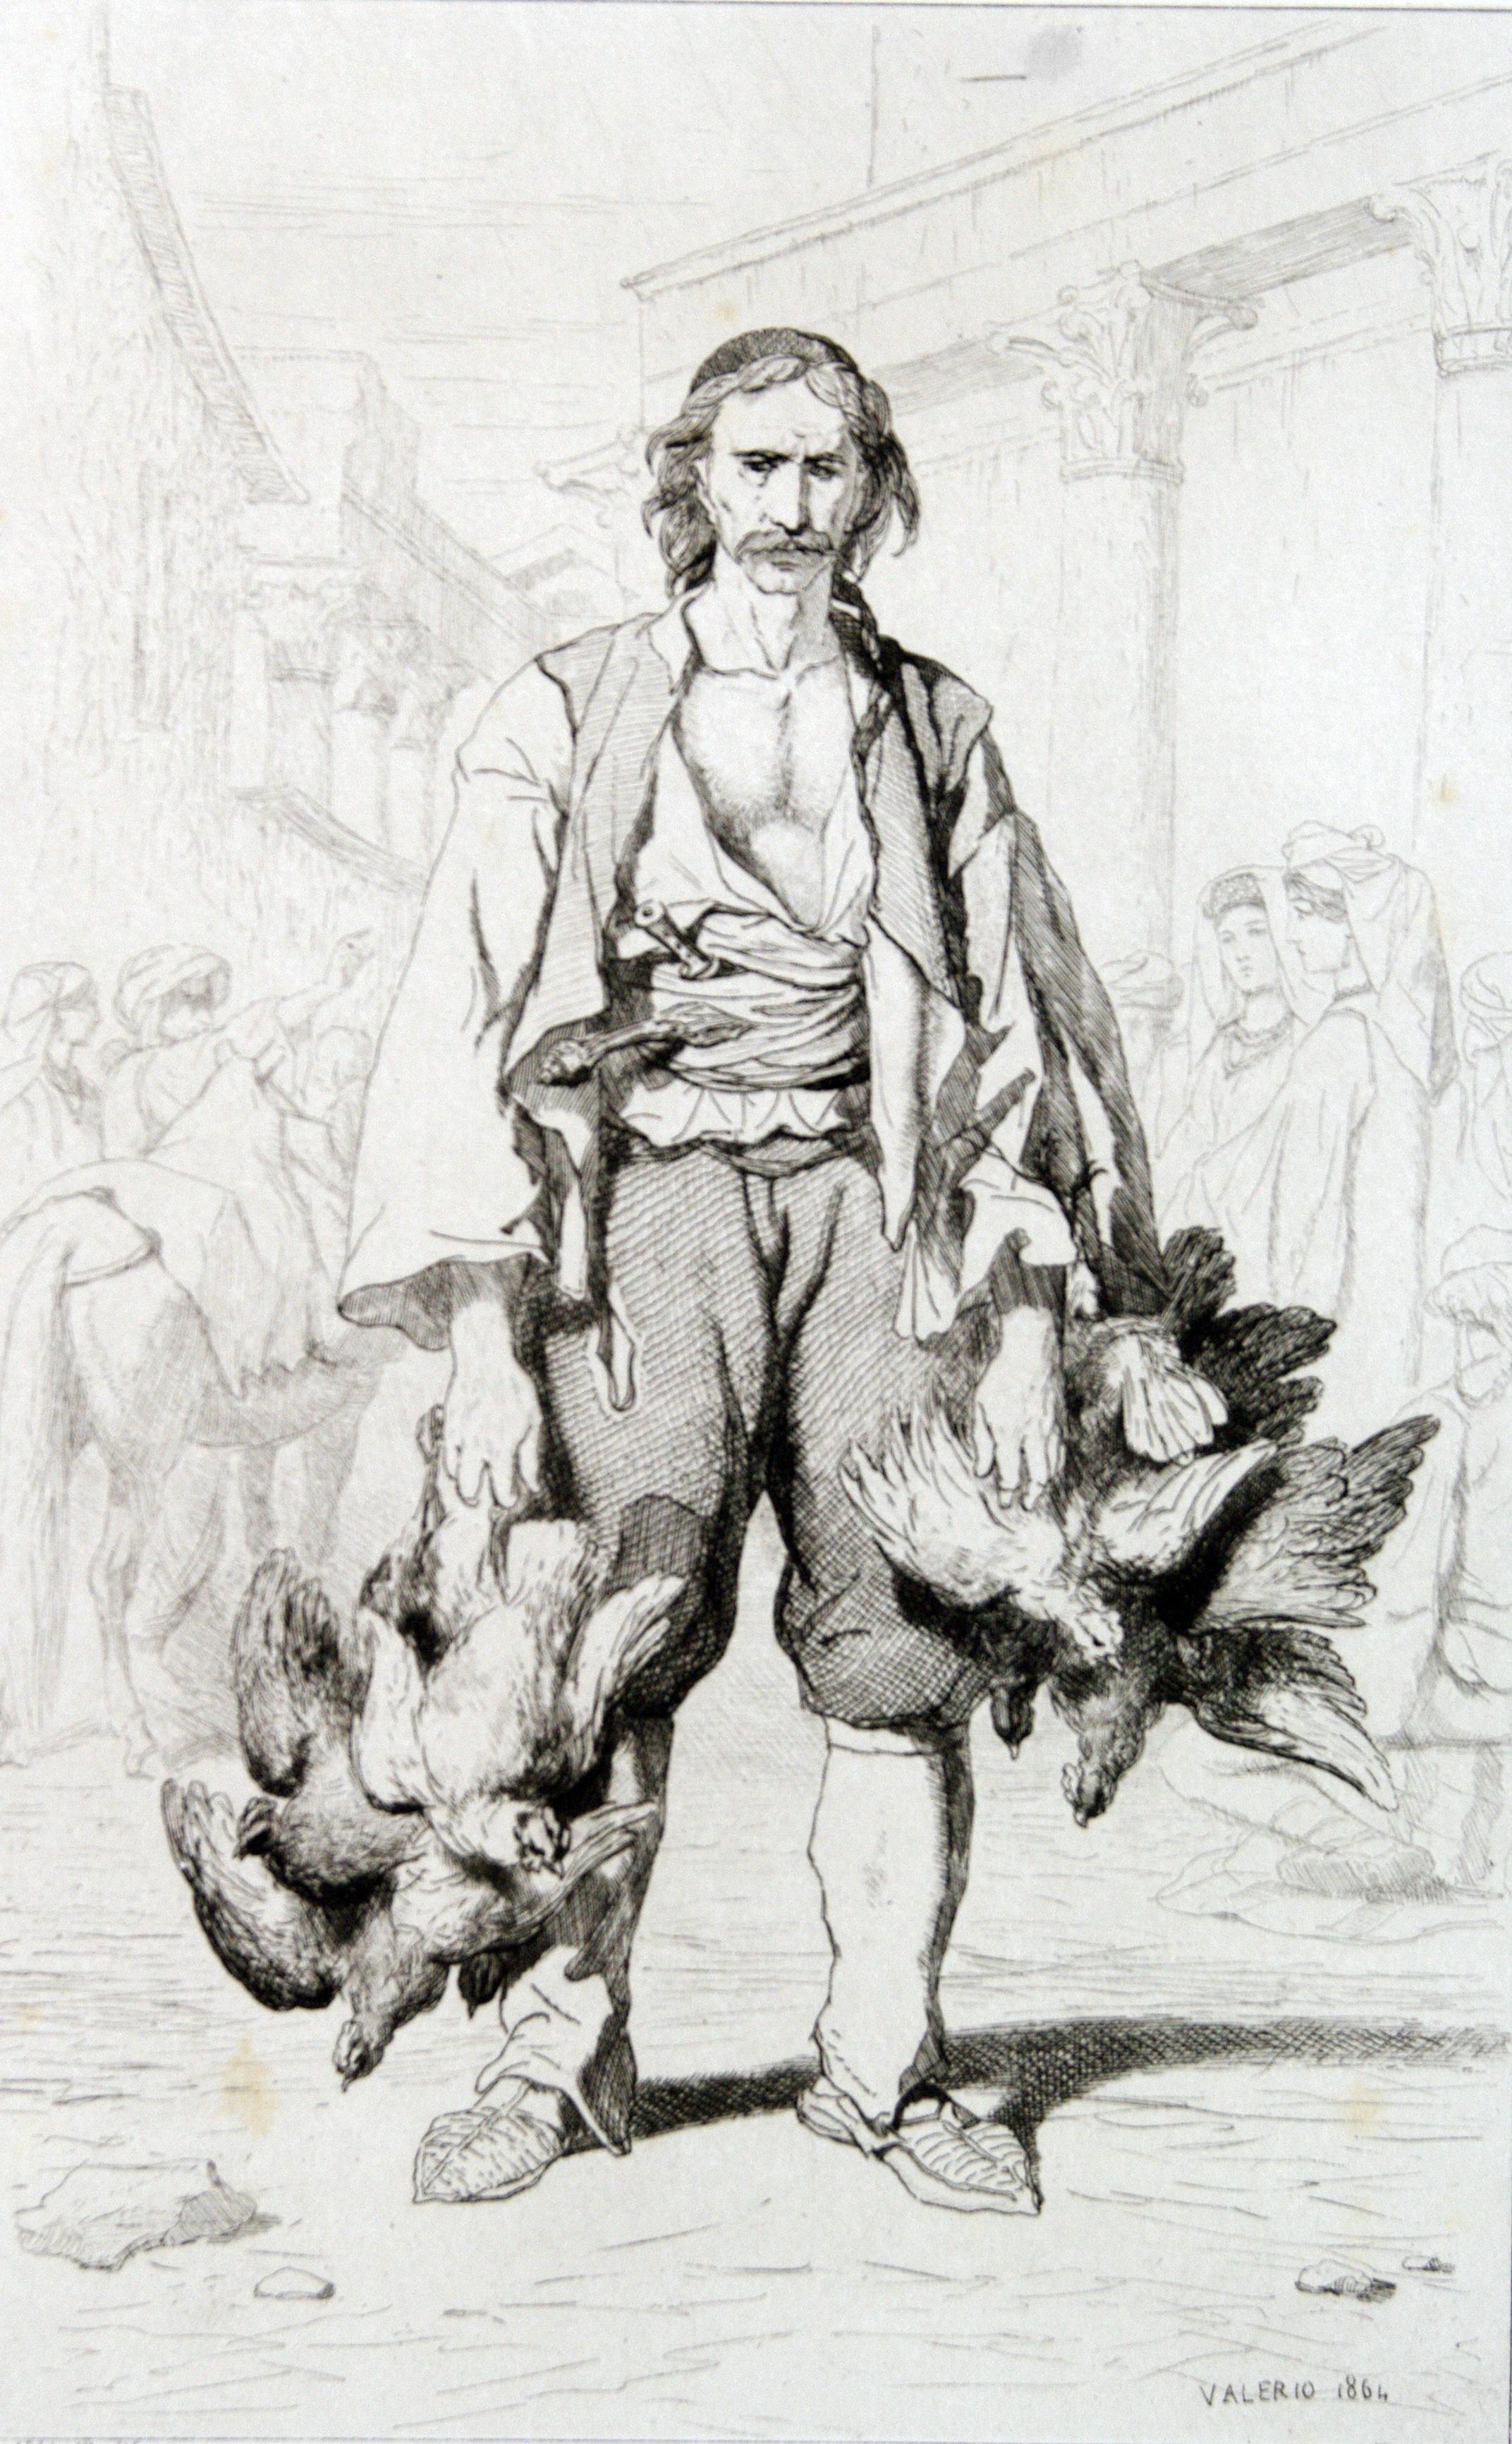 Marko Kralevici - Wikipedia